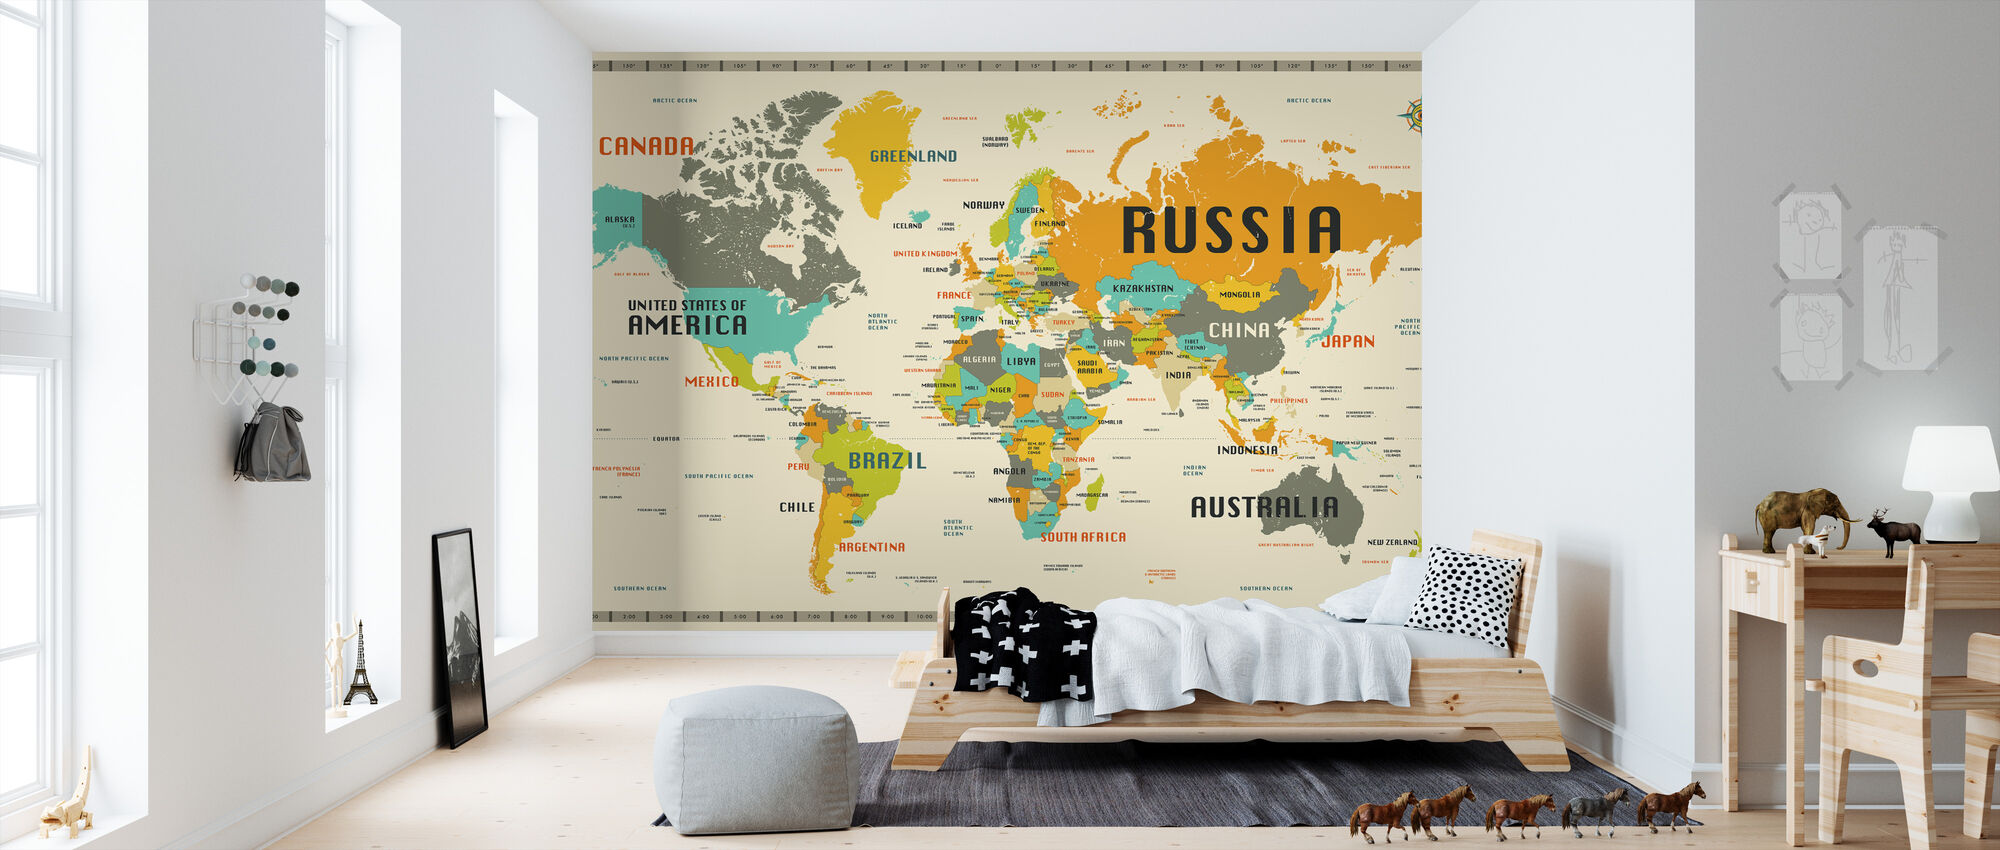 World Map Explore - Wallpaper - Kids Room